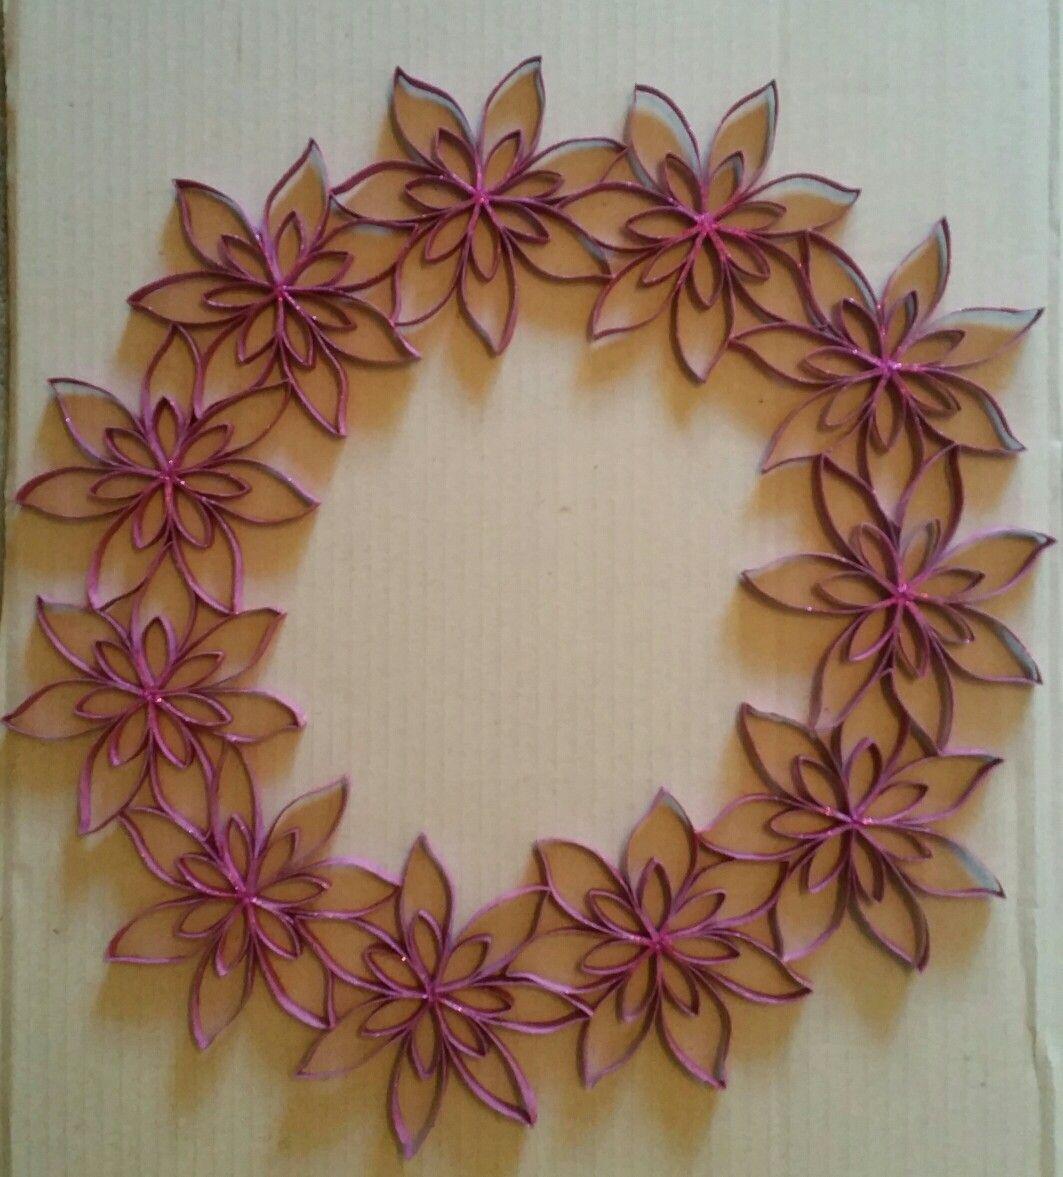 Tpr pink wreath rolled paper art toilet roll art - Decoracion con carton de papel higienico ...